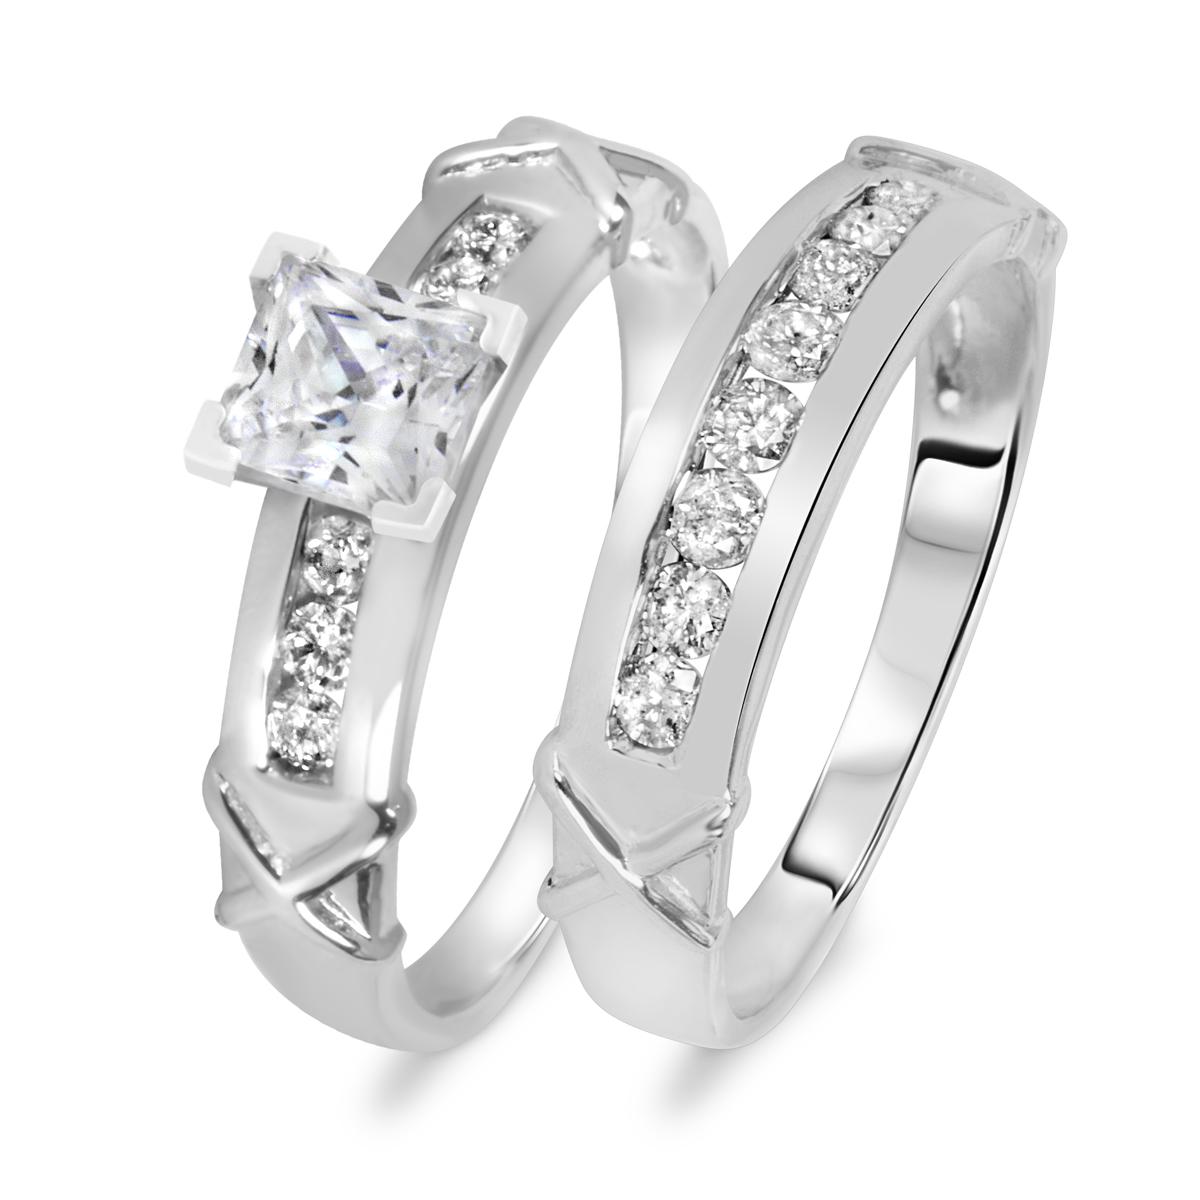 1 1/5 CT. T.W. Diamond Women's Bridal Wedding Ring Set 14K White Gold